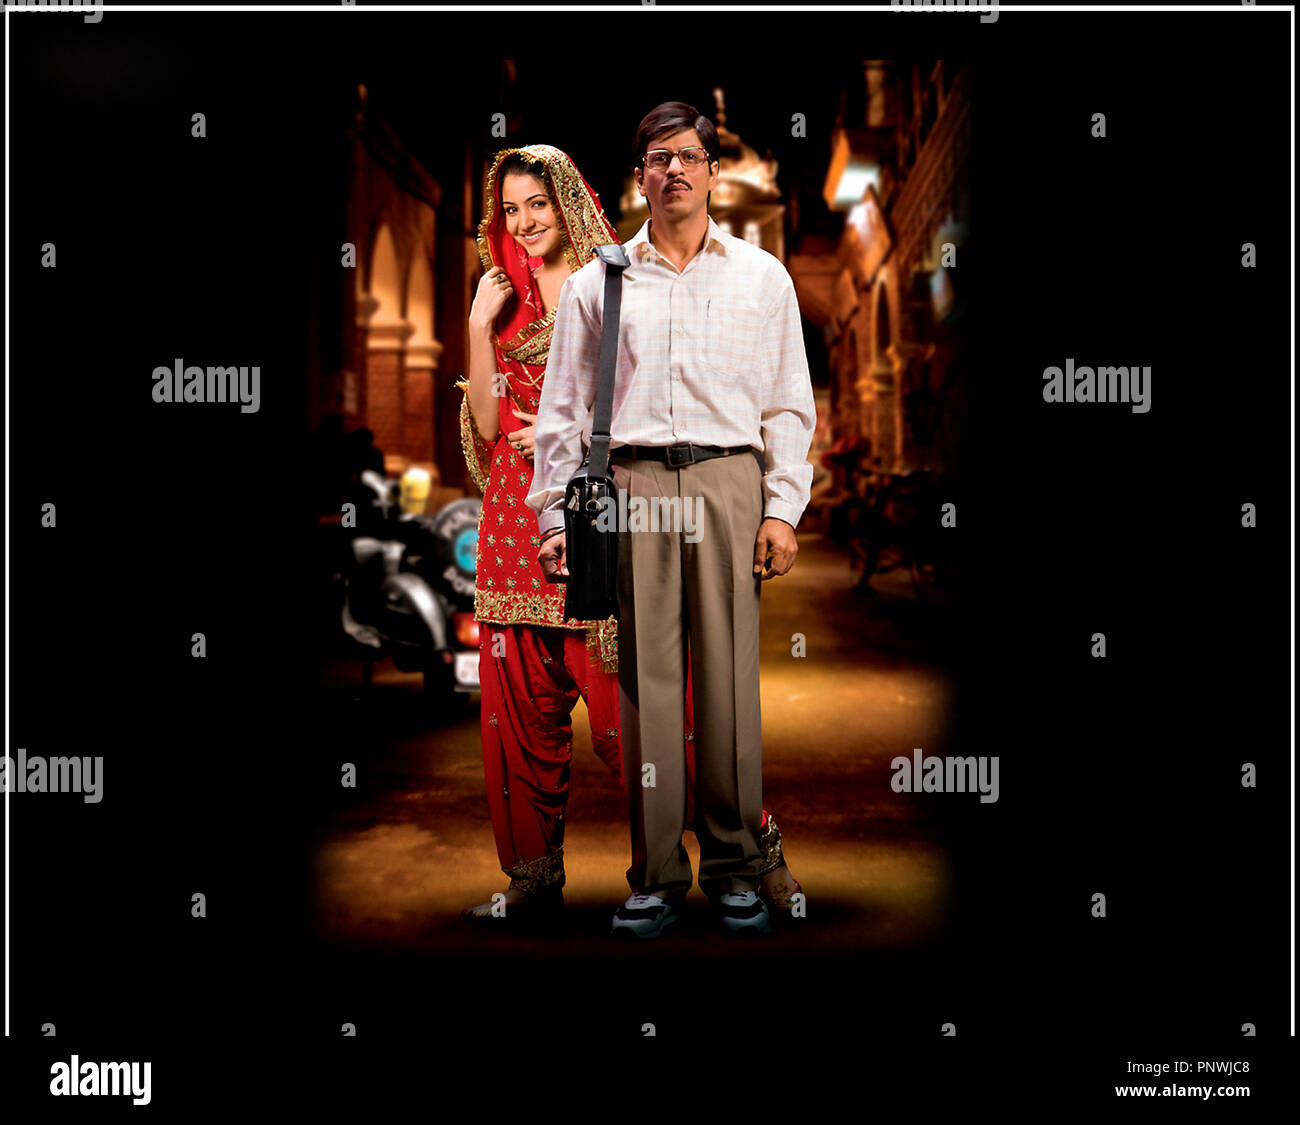 English Films India Stock Photos & English Films India Stock